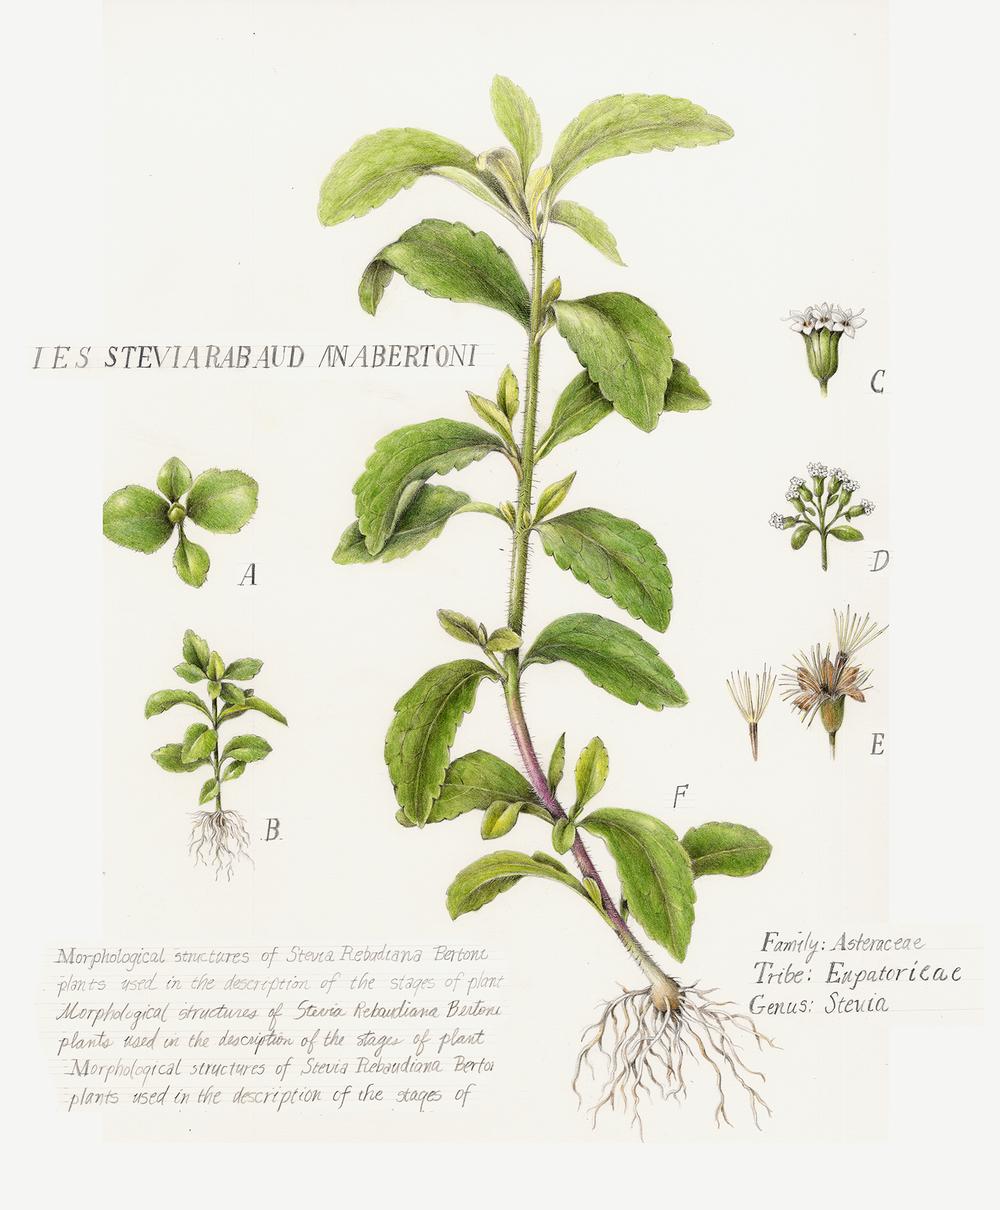 Stevia-Stevia rebaudiana 1.jpg